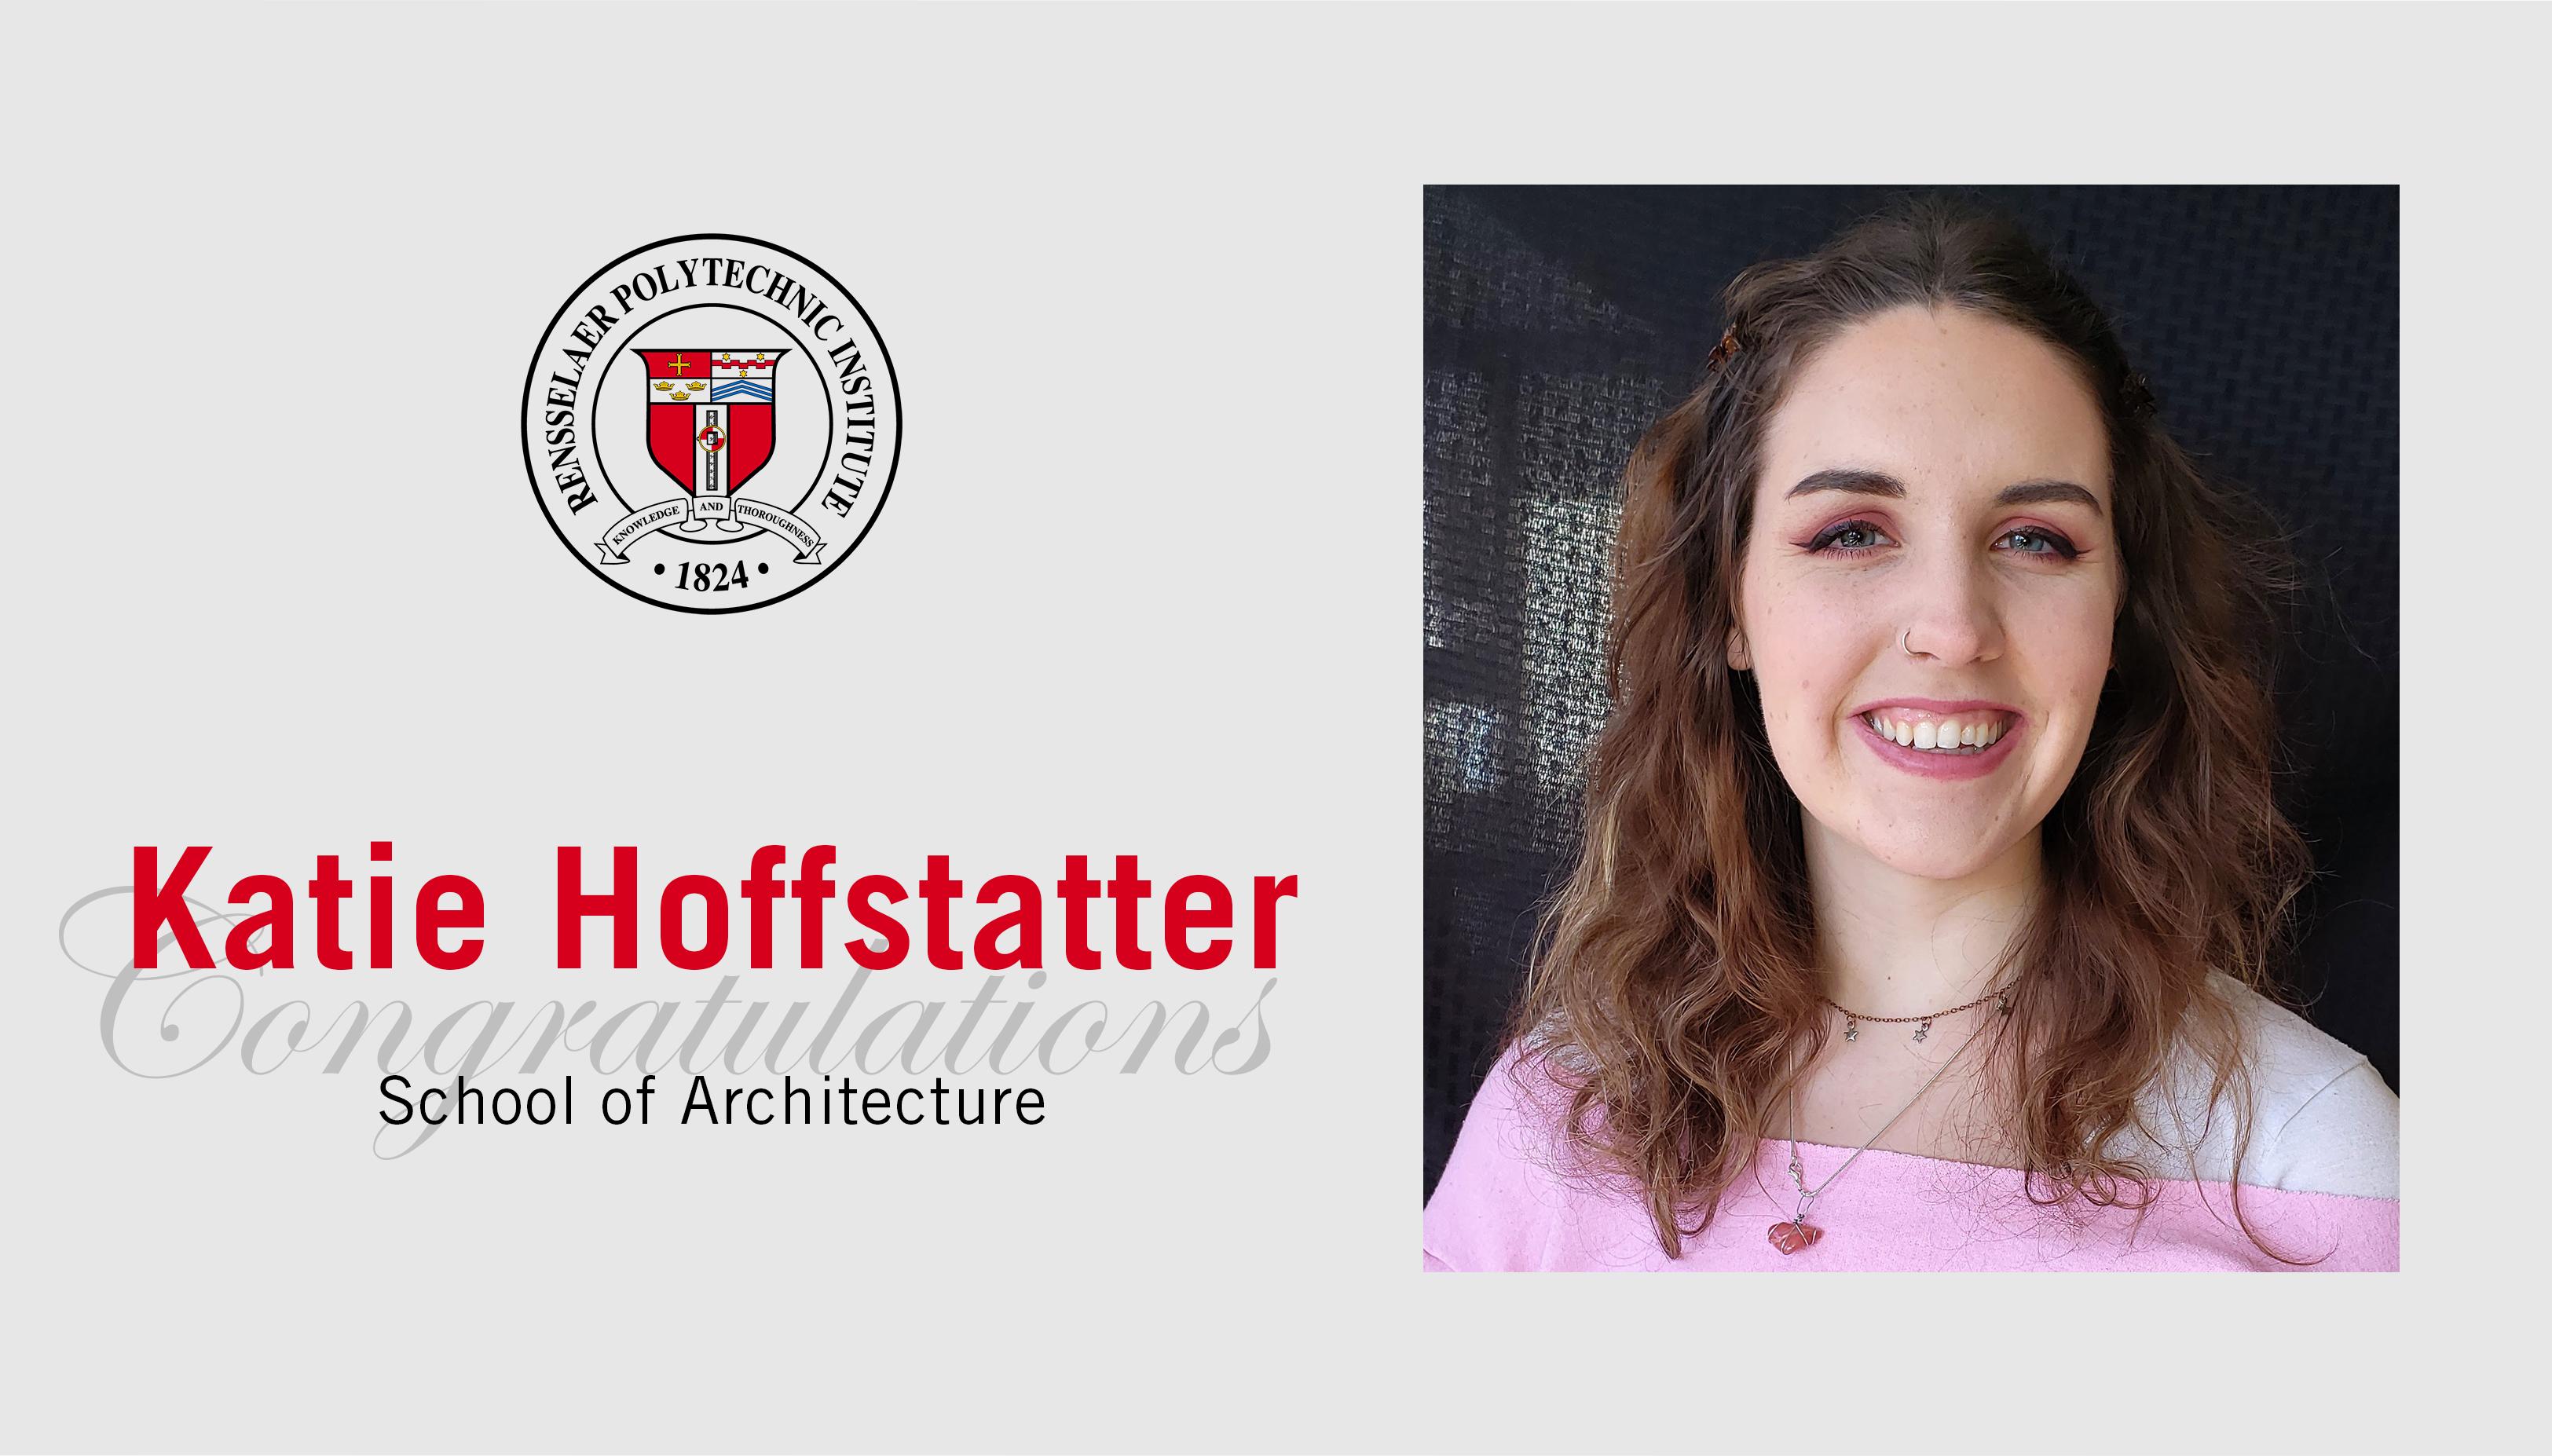 Katie Hoffstatter